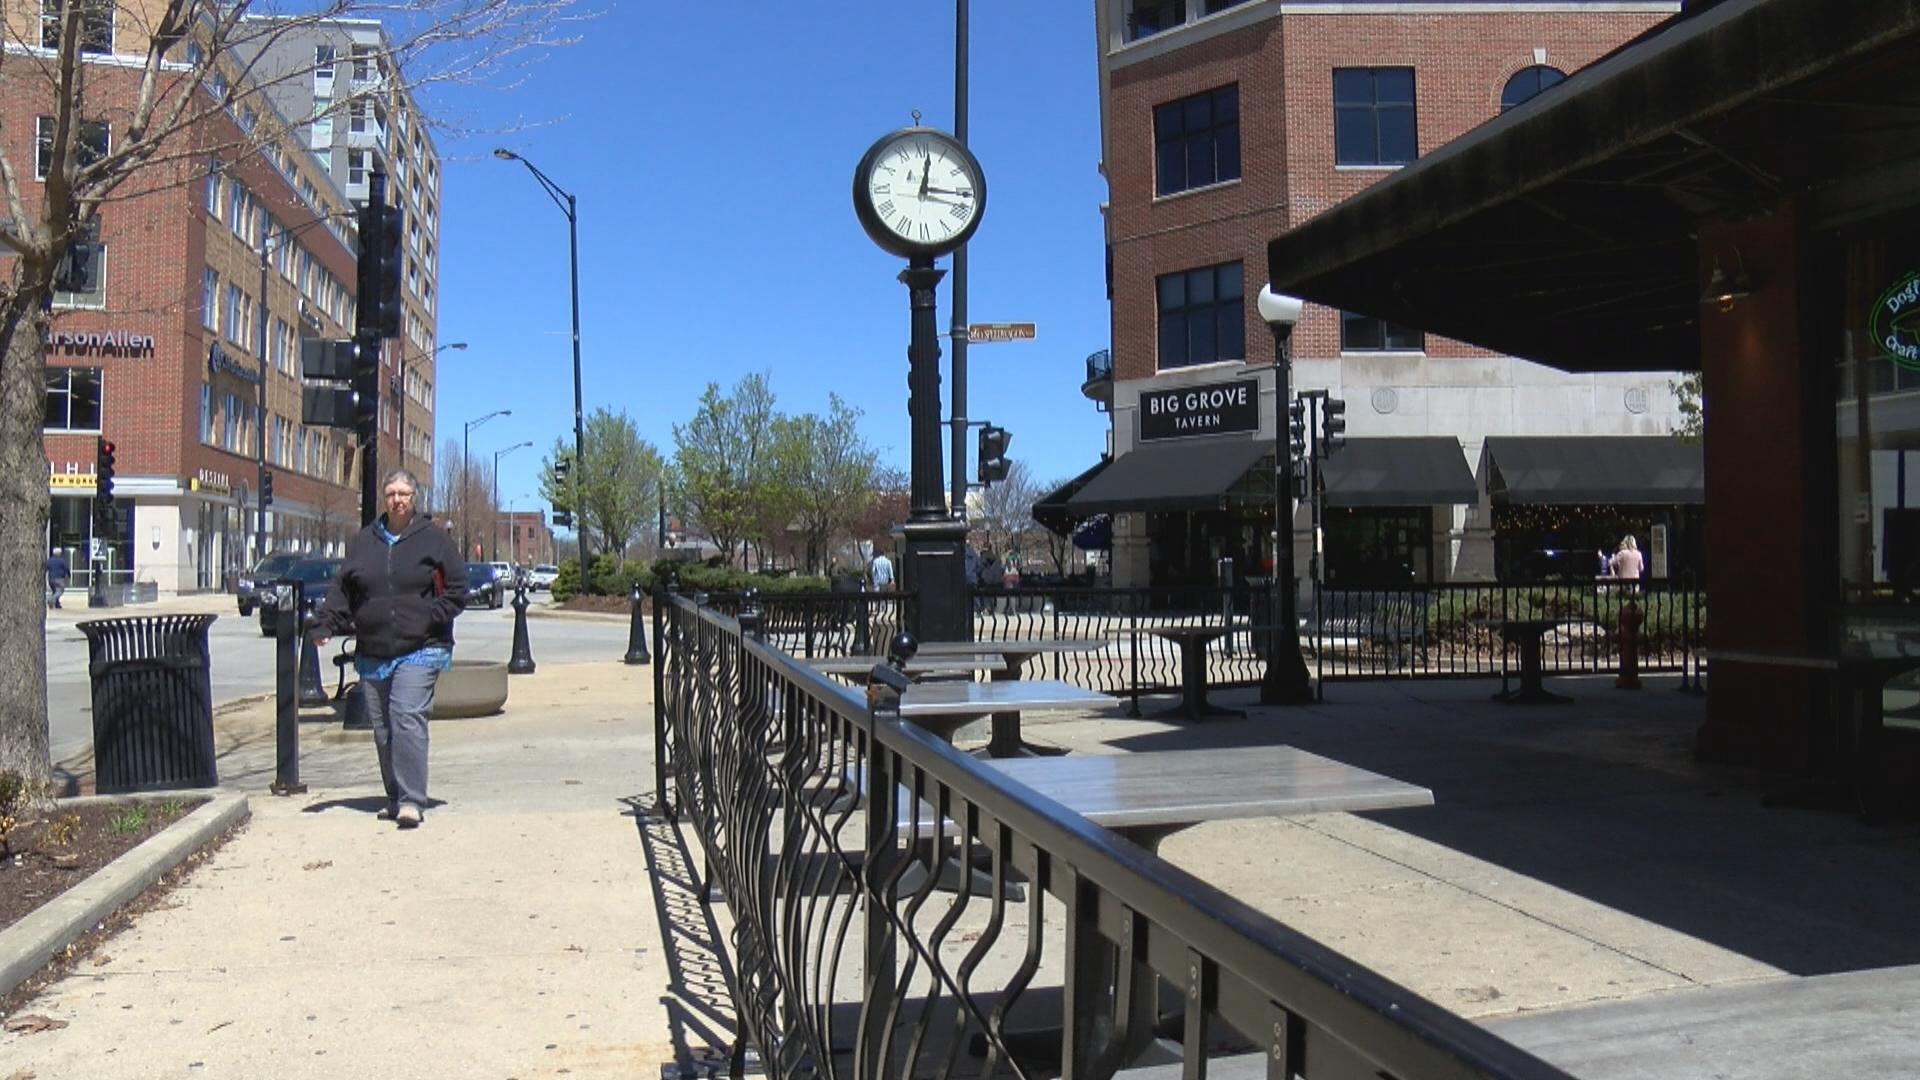 downtown champaign (2)_1555363293164.jpg.jpg